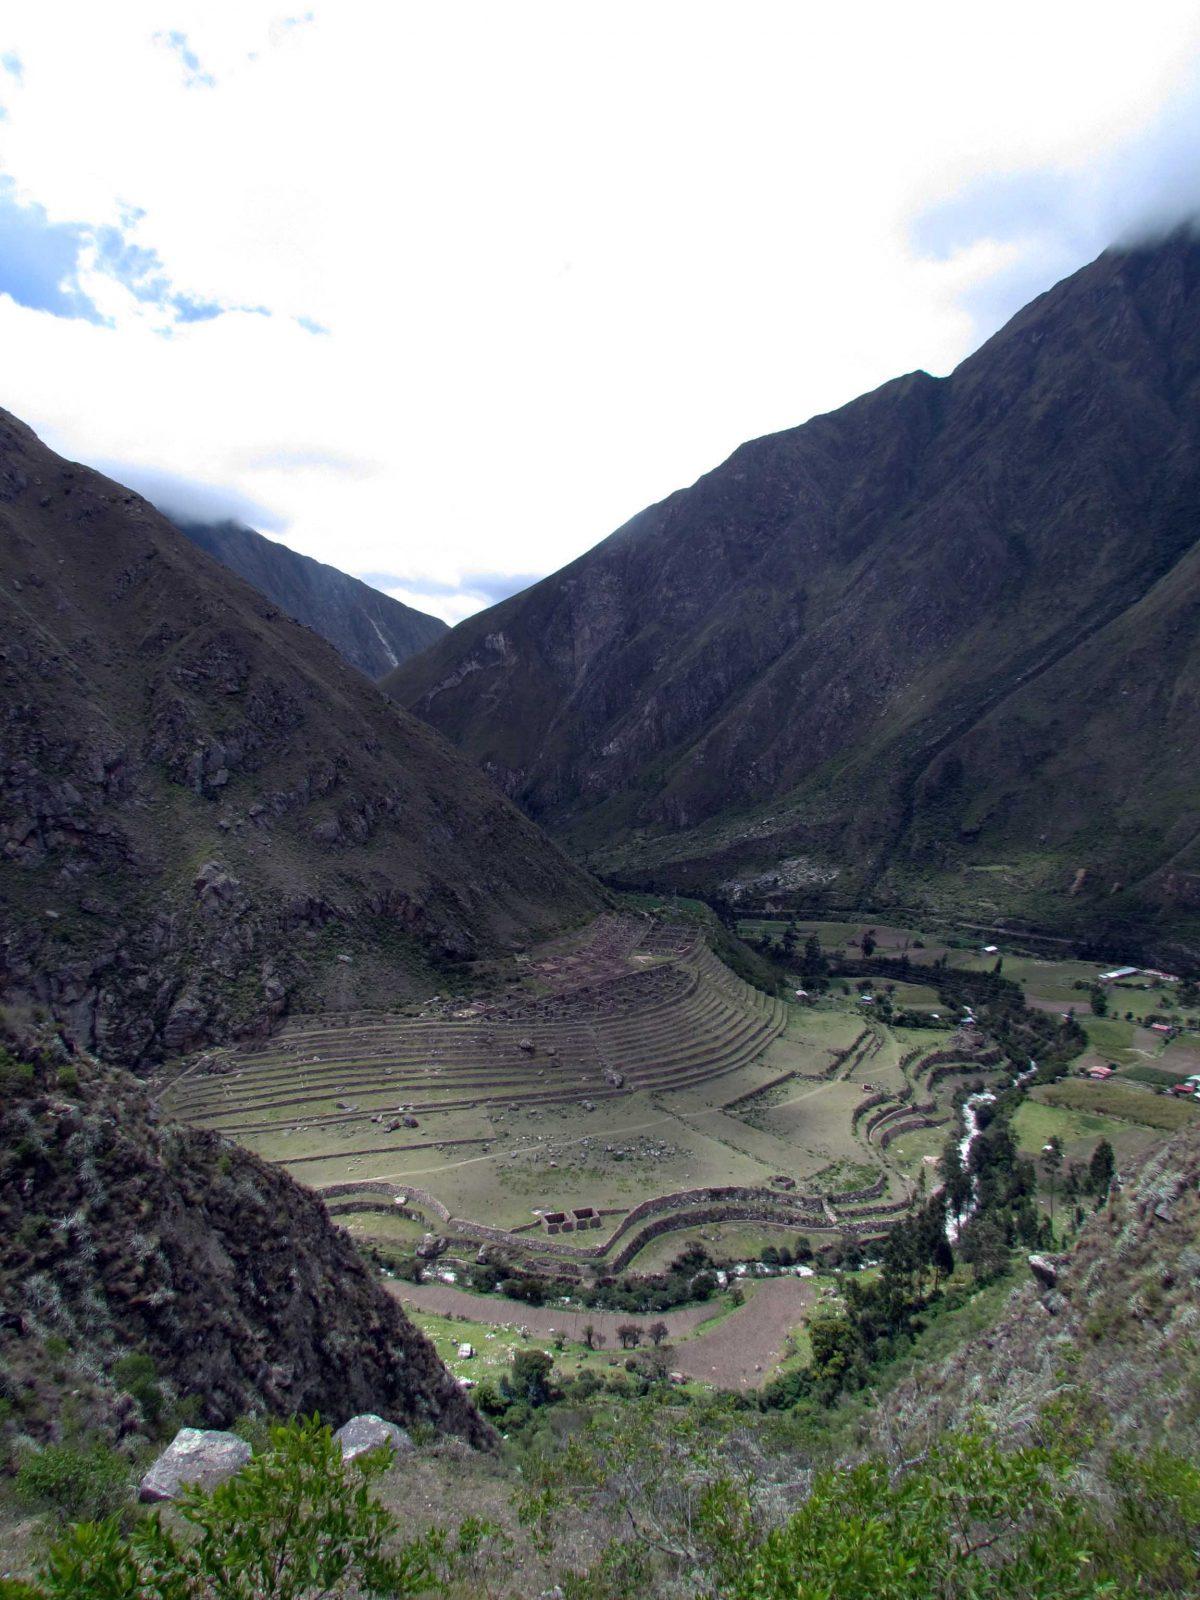 View of Llactapata, Inca Trail, Peru | ©Angela Drake